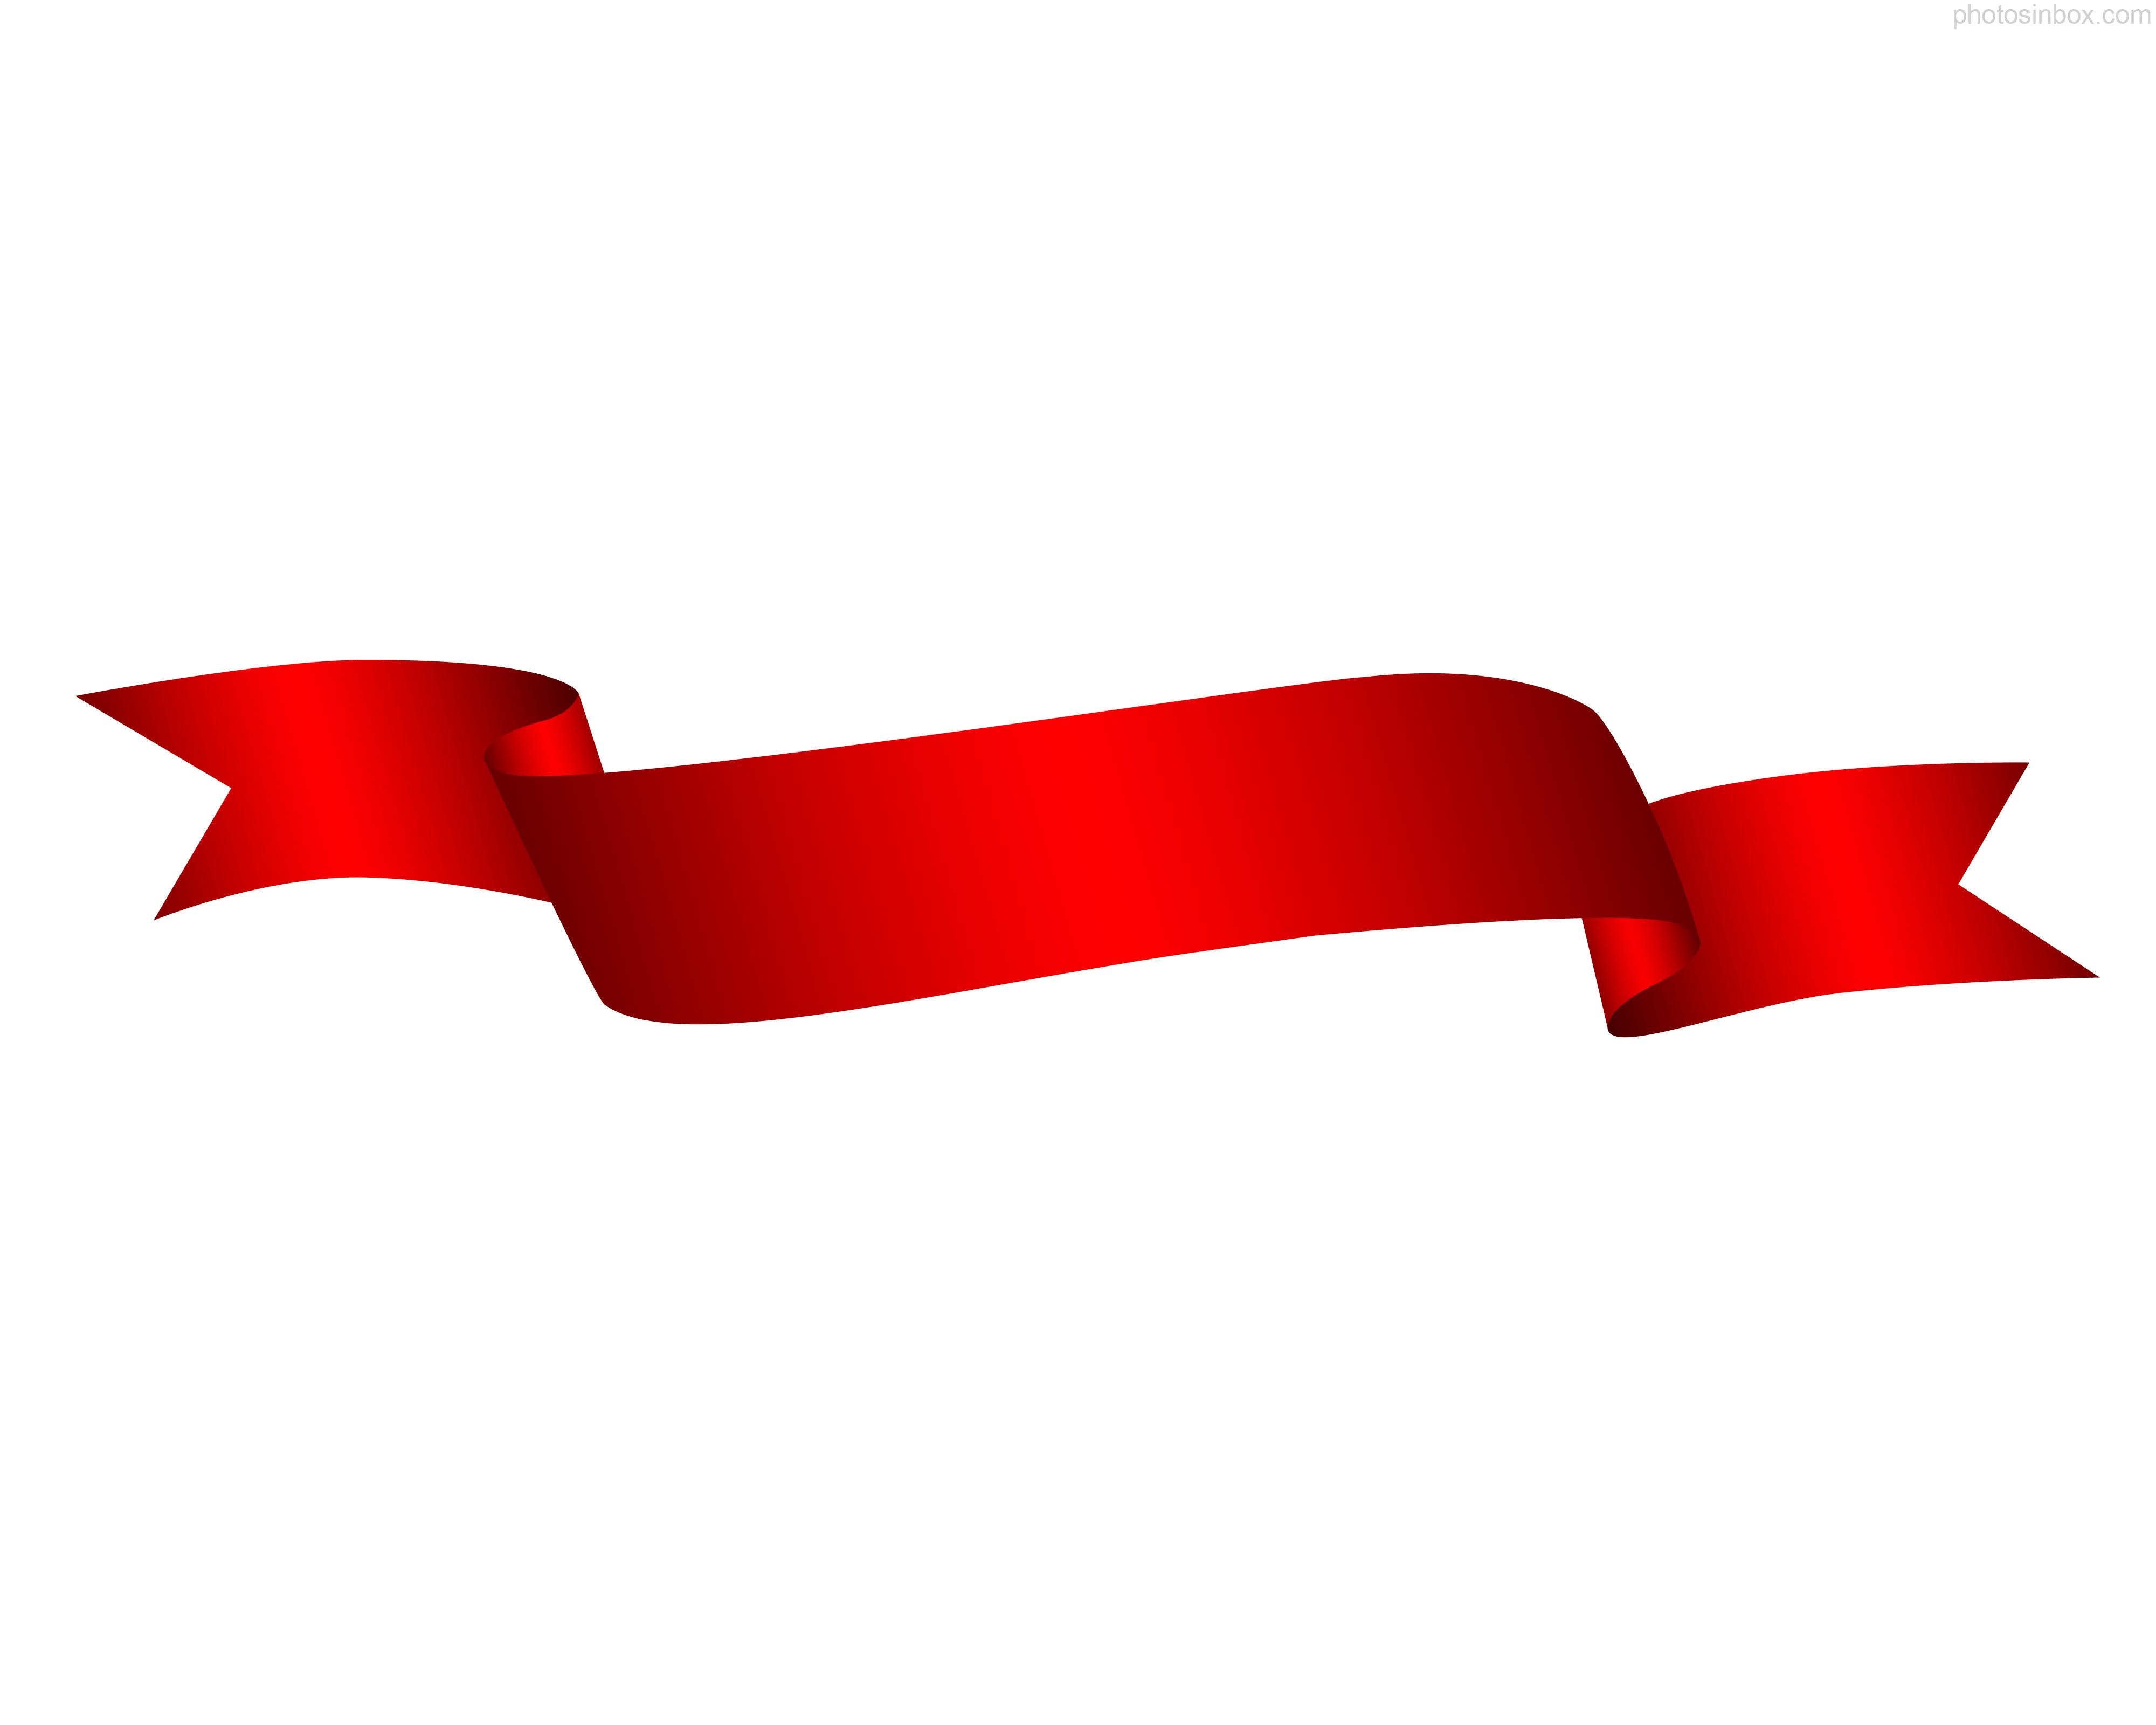 Red Ribbon Photosinbox-Red Ribbon Photosinbox-9